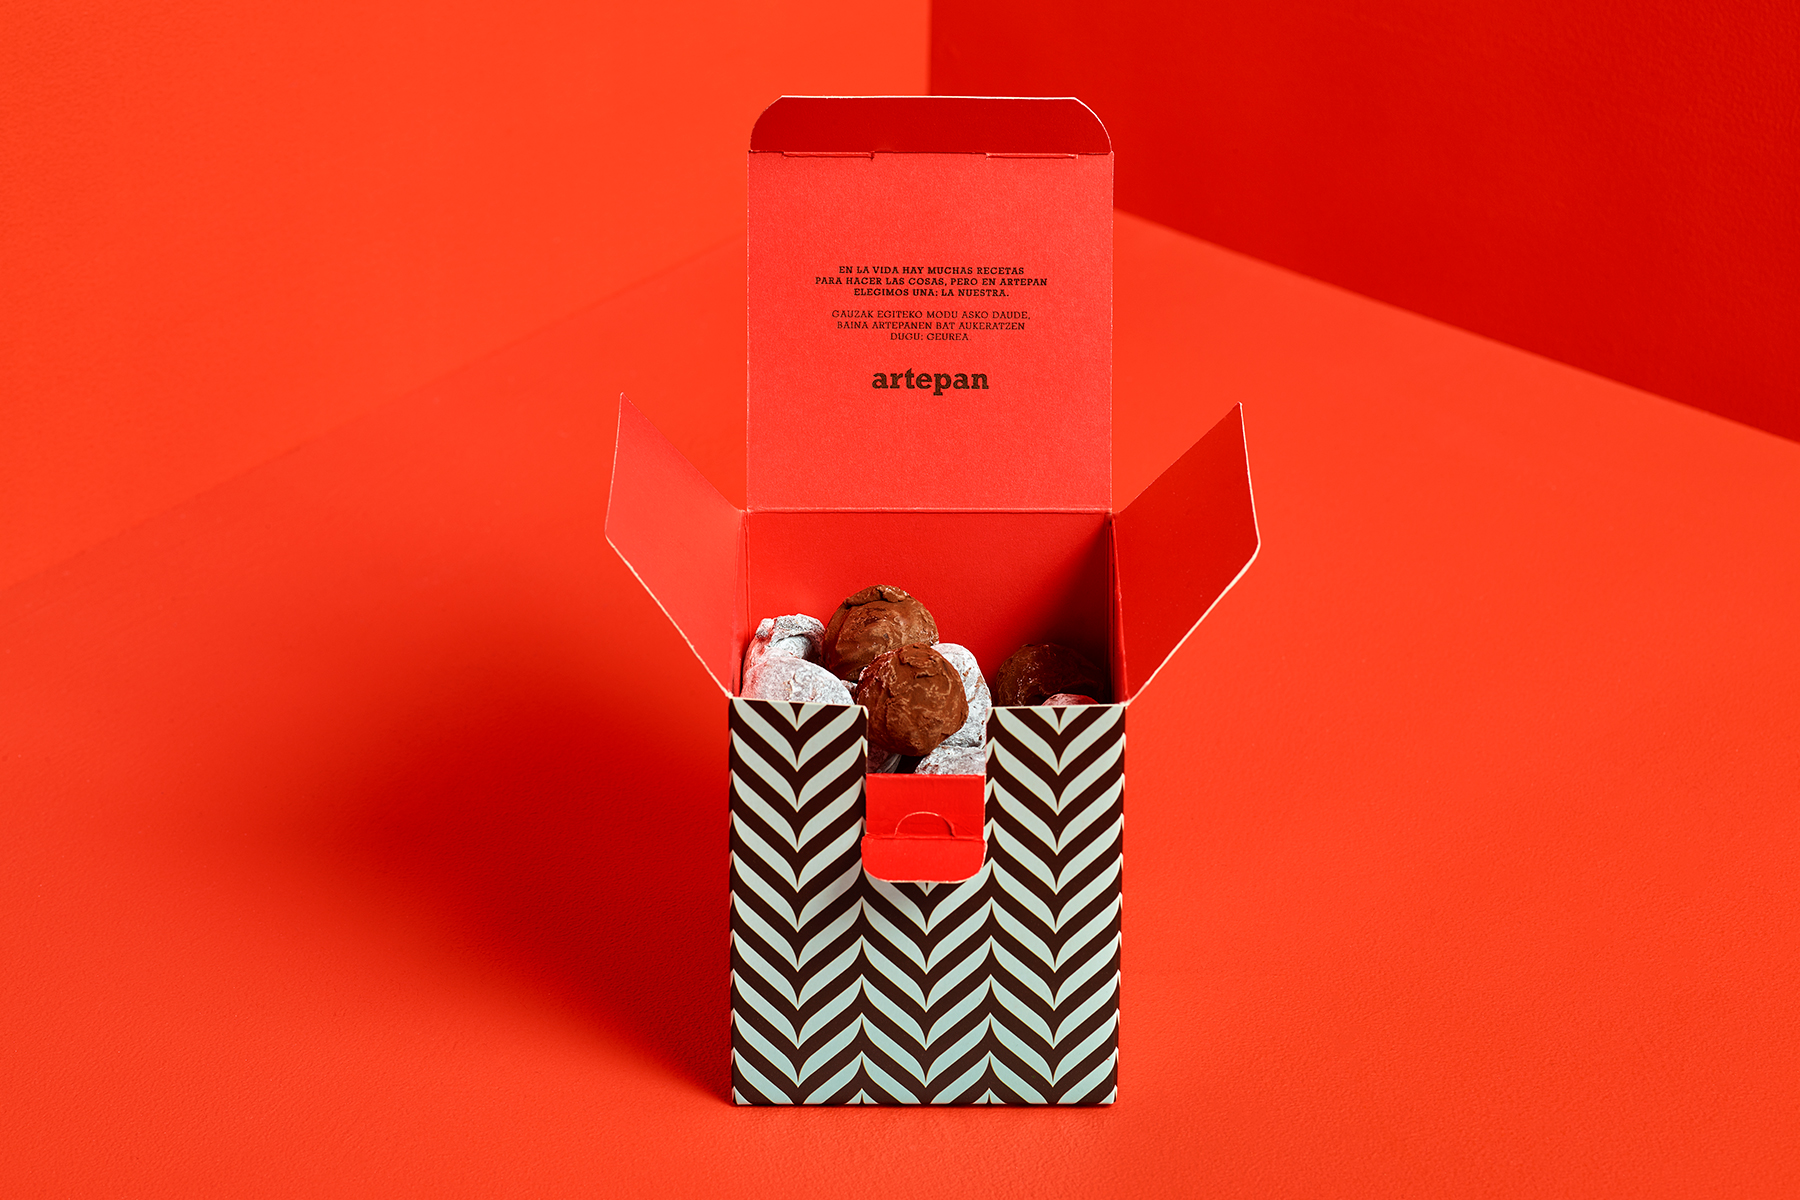 Artepan Packaging by Línea Recta - Creative Work - $i